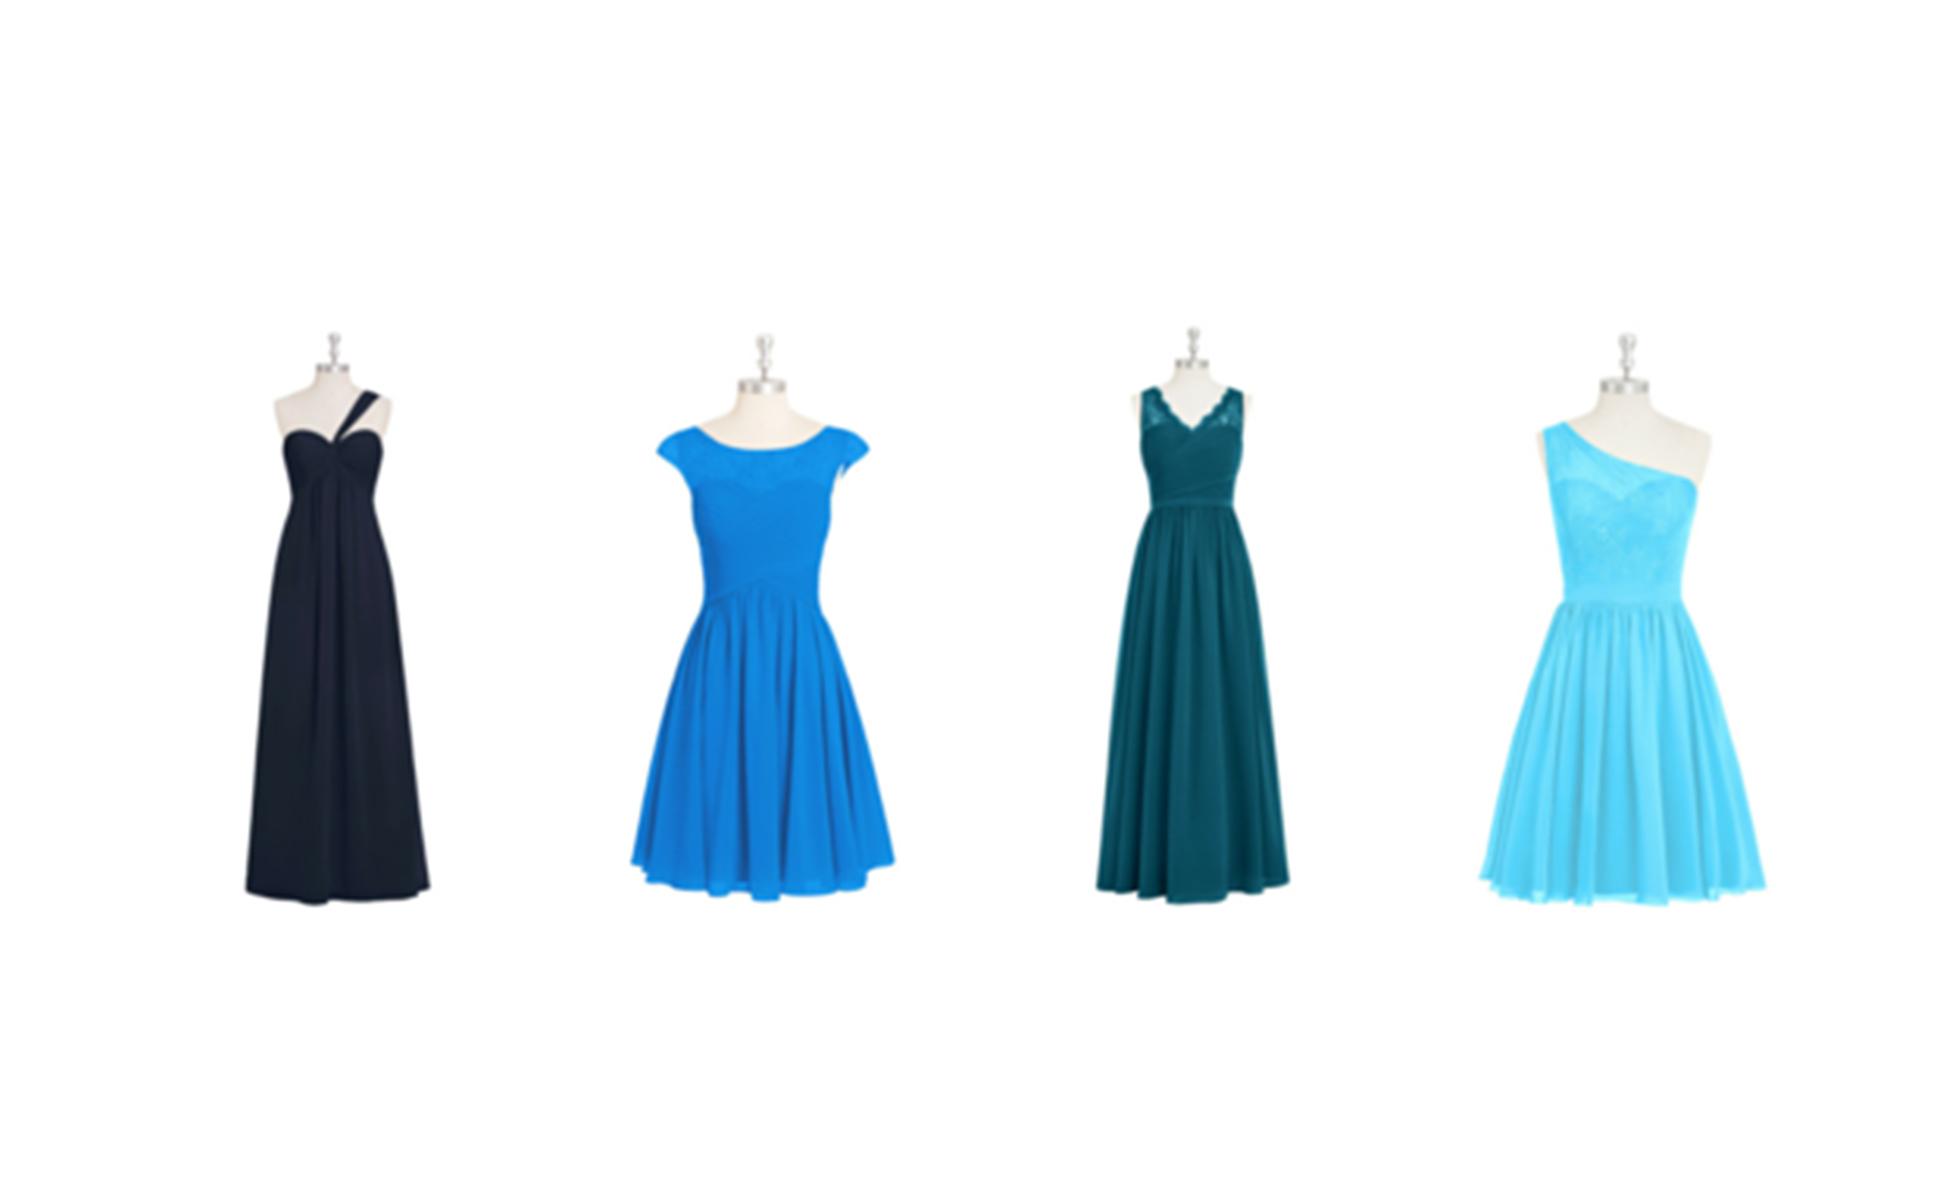 Dress designs